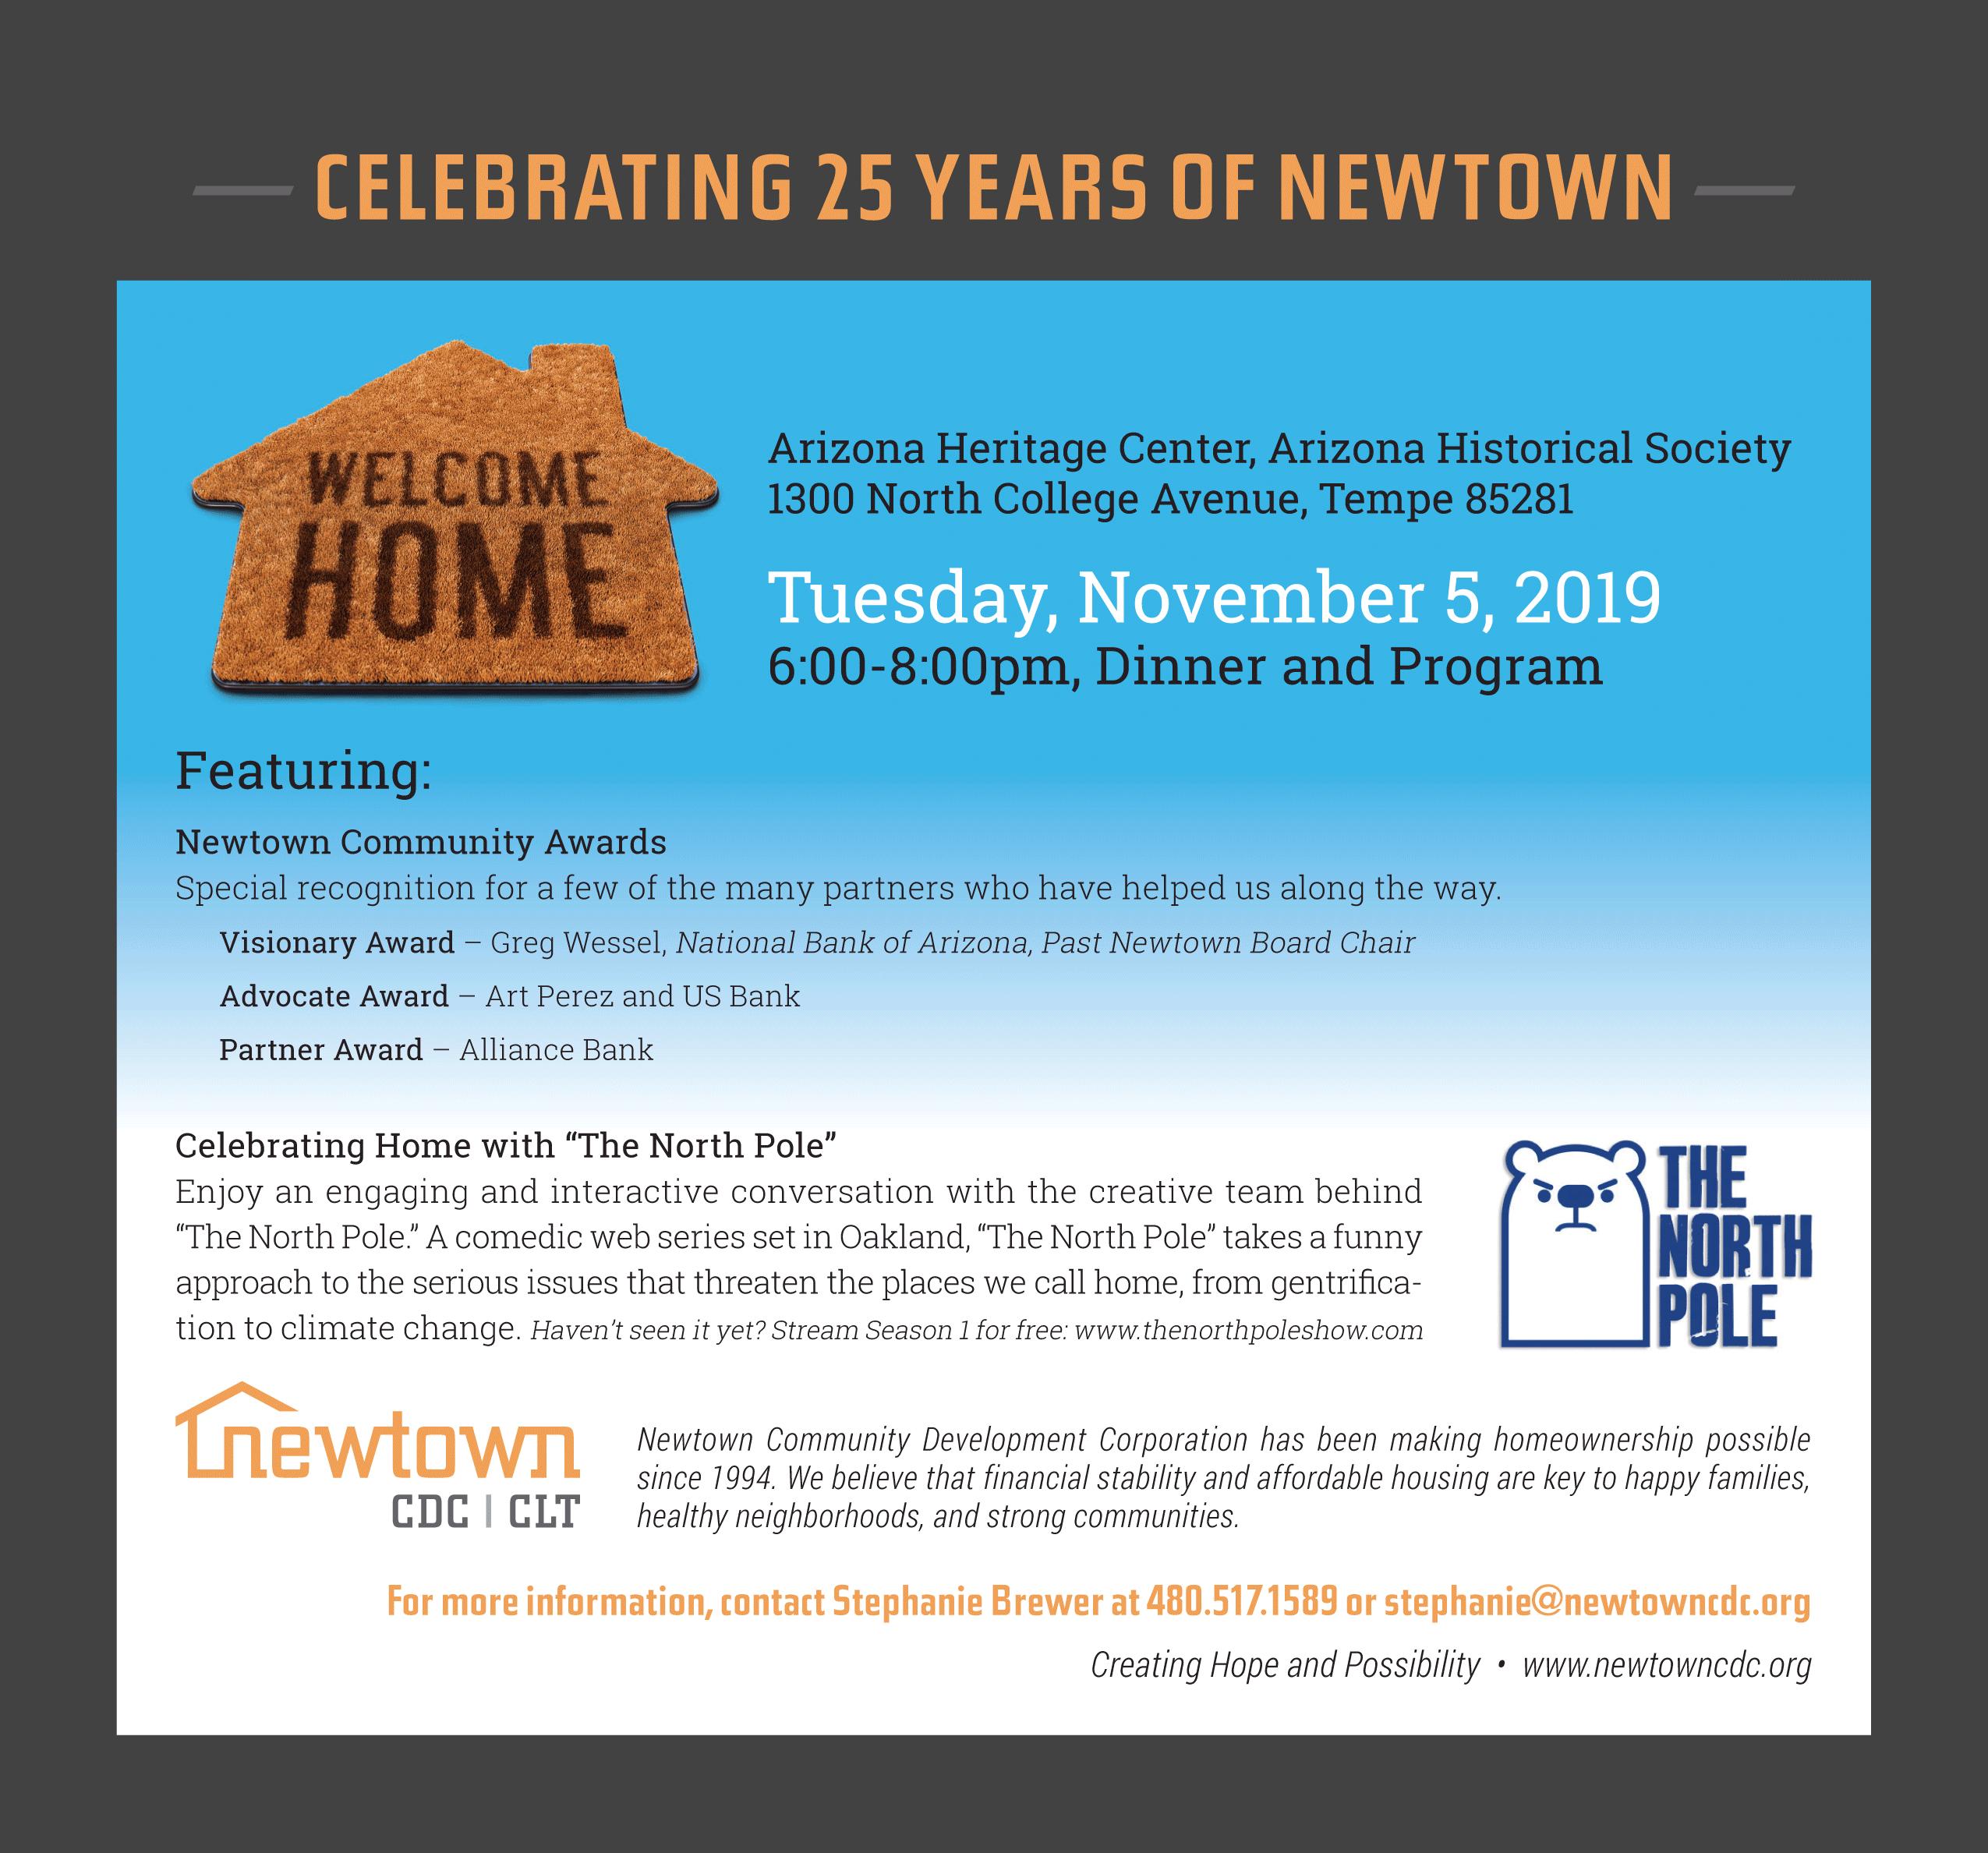 Celebrating 25 Years of Newtown